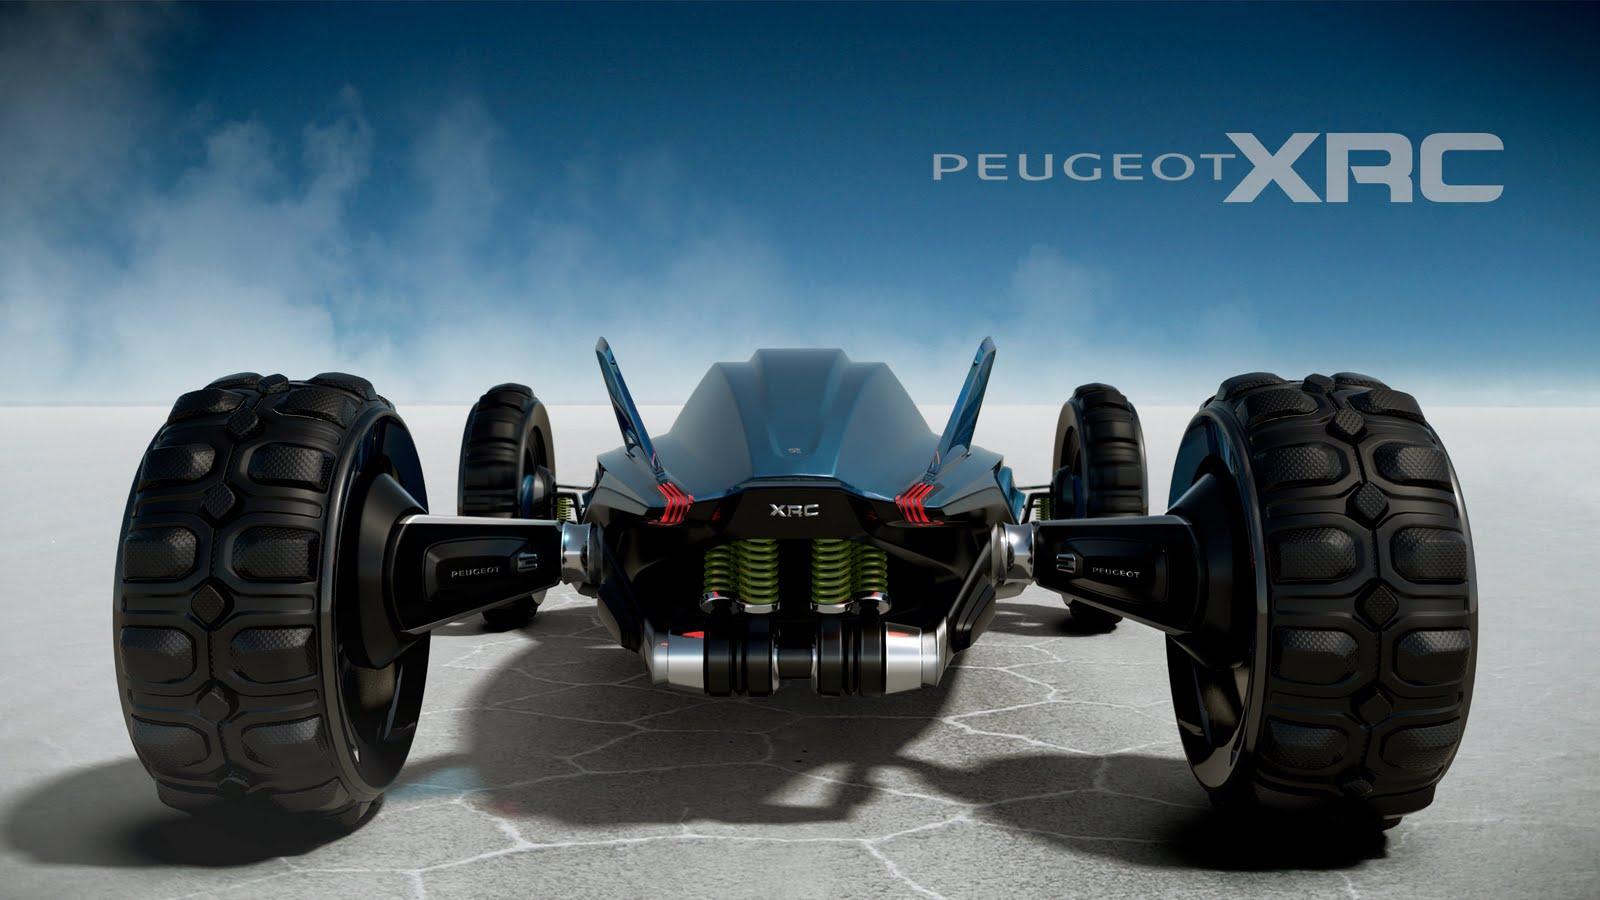 peugeot-xrc-concept-014.jpg